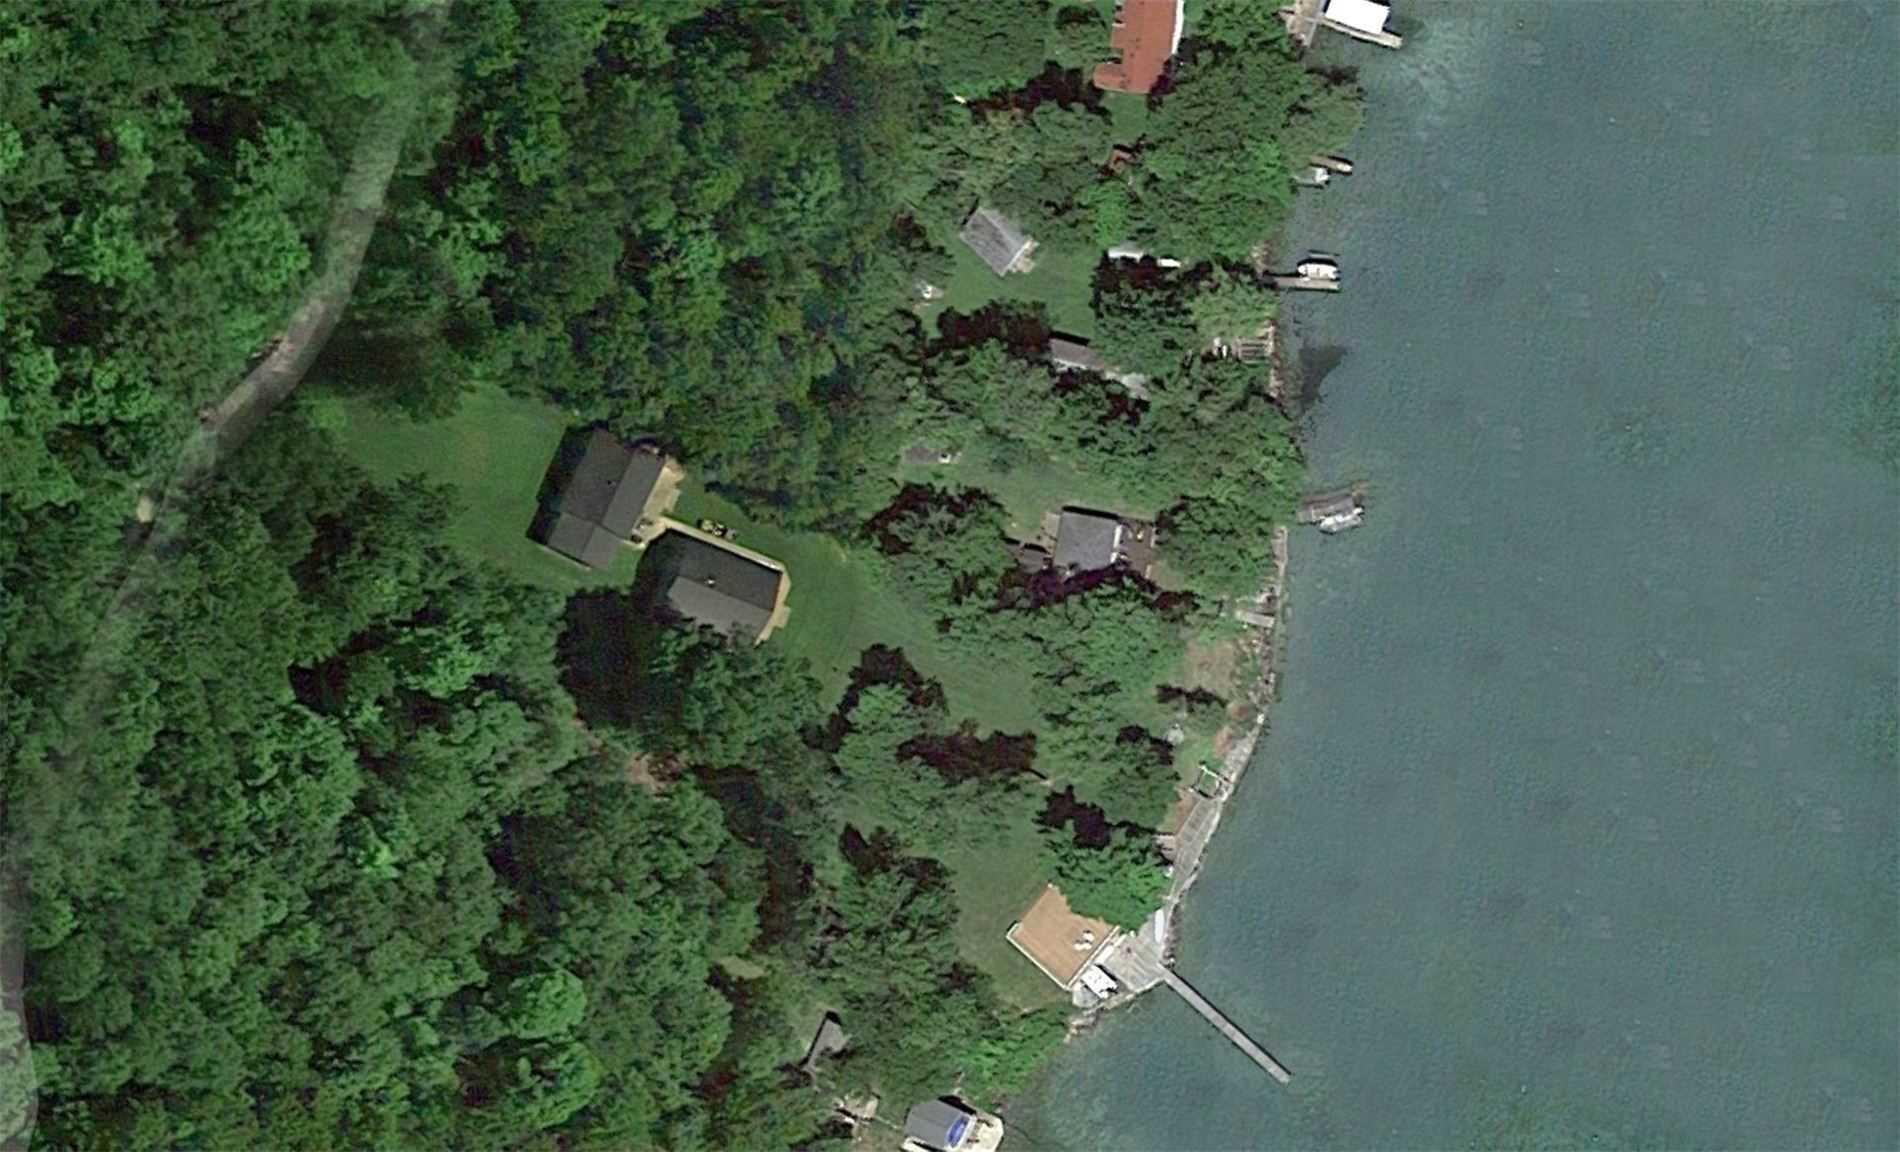 Lot 33 Snake Island Rd, Georgina Islands - $345,000 (N4570179)   Zoocasa